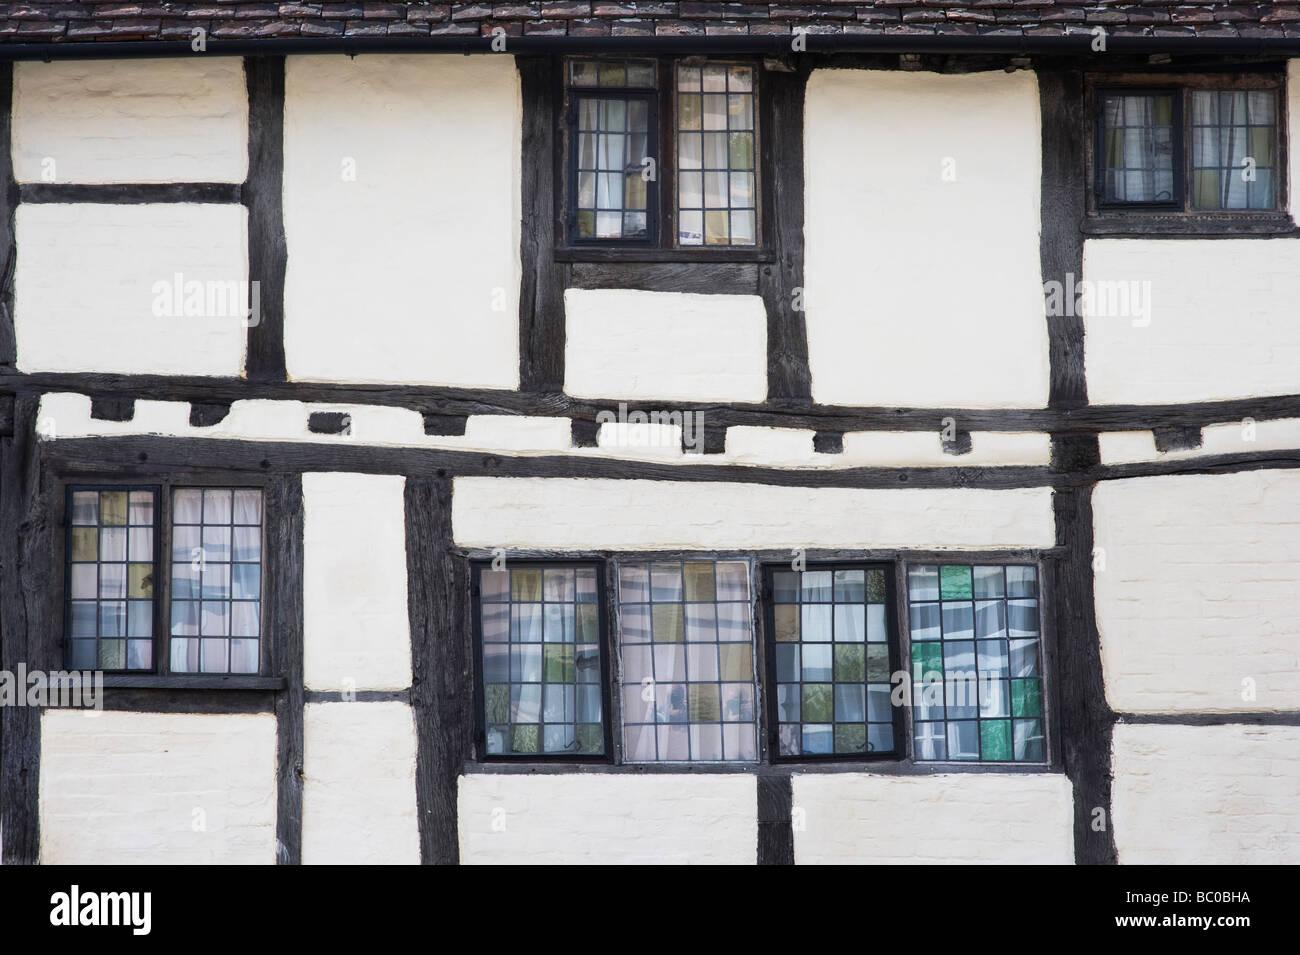 Tudor timber framed houses,Stratford upon Avon, Warwickshire, England - Stock Image